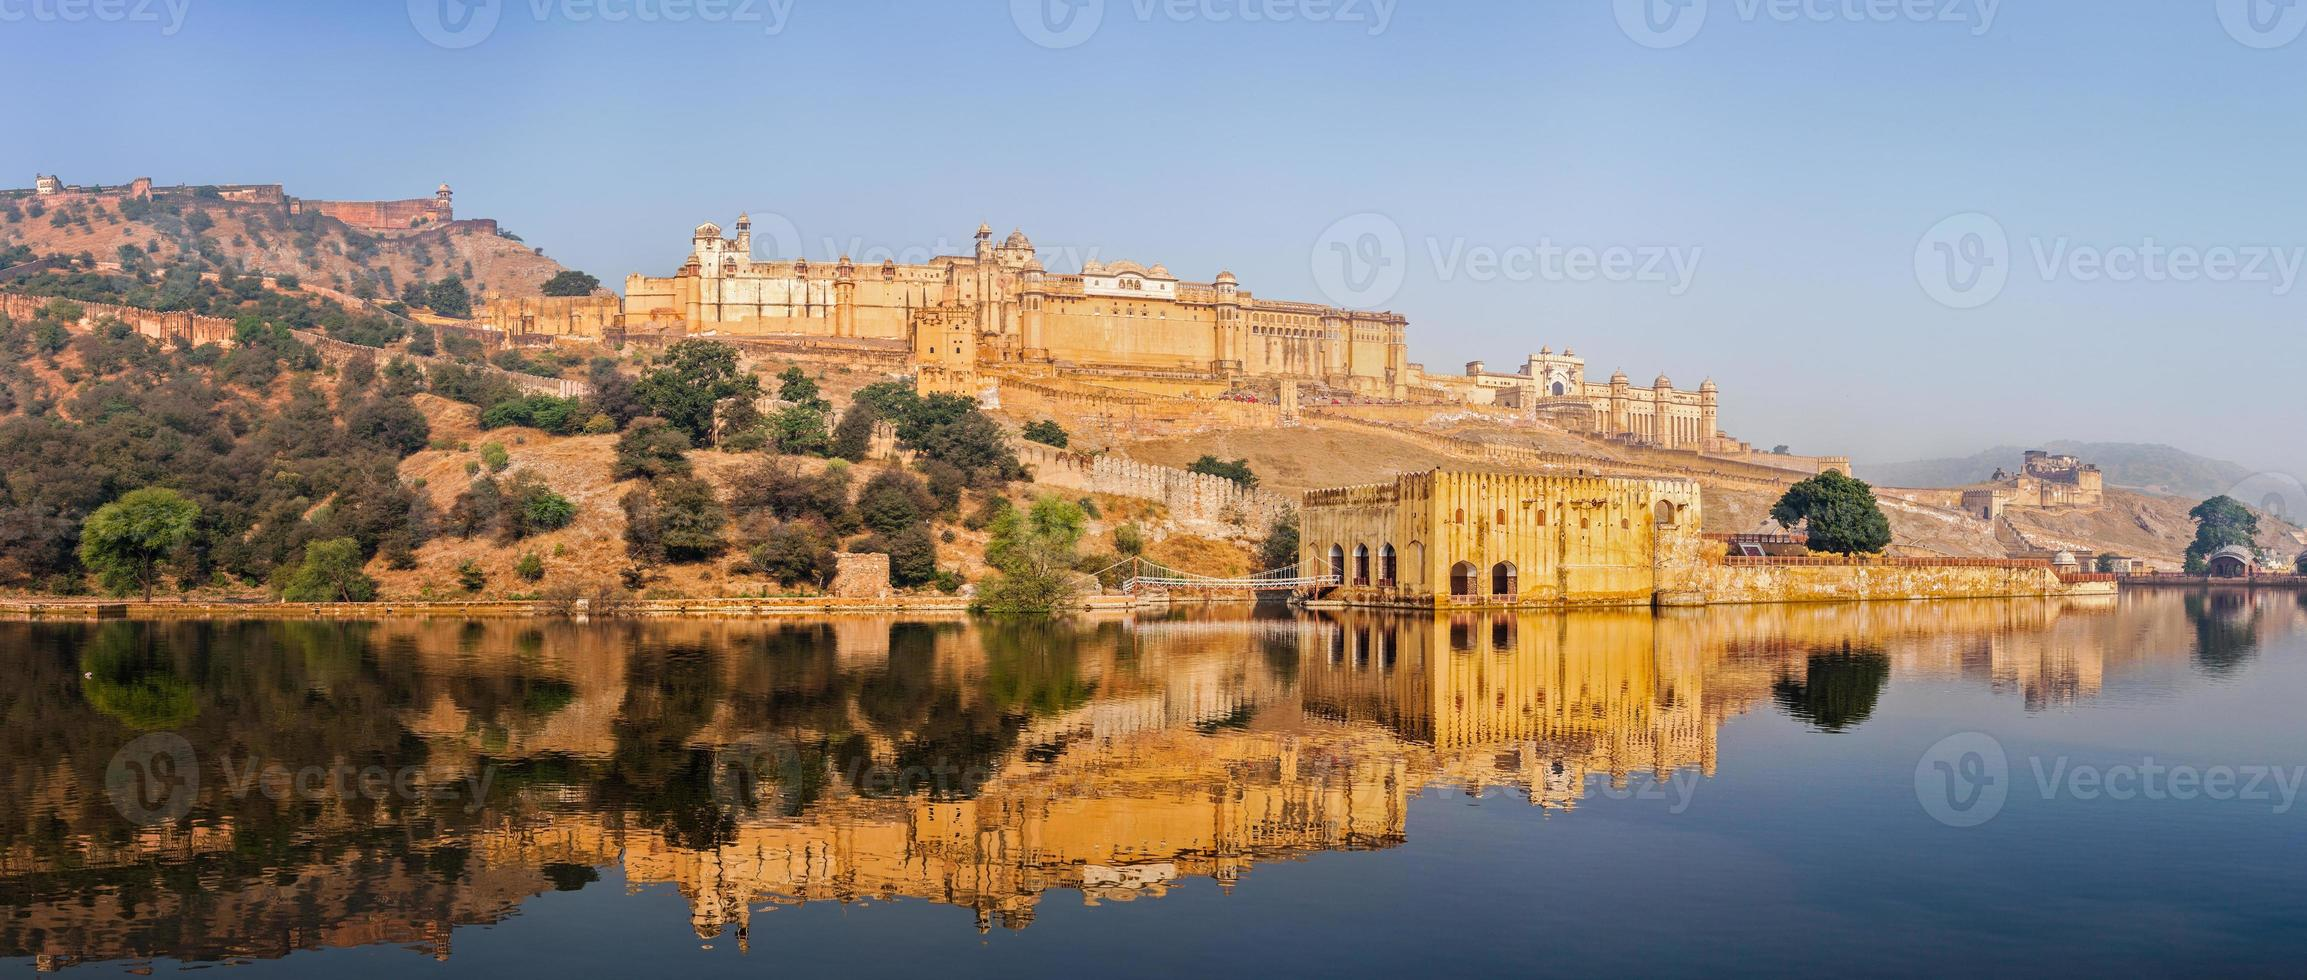 panorama de amer (amber) fort, rajasthan, índia foto